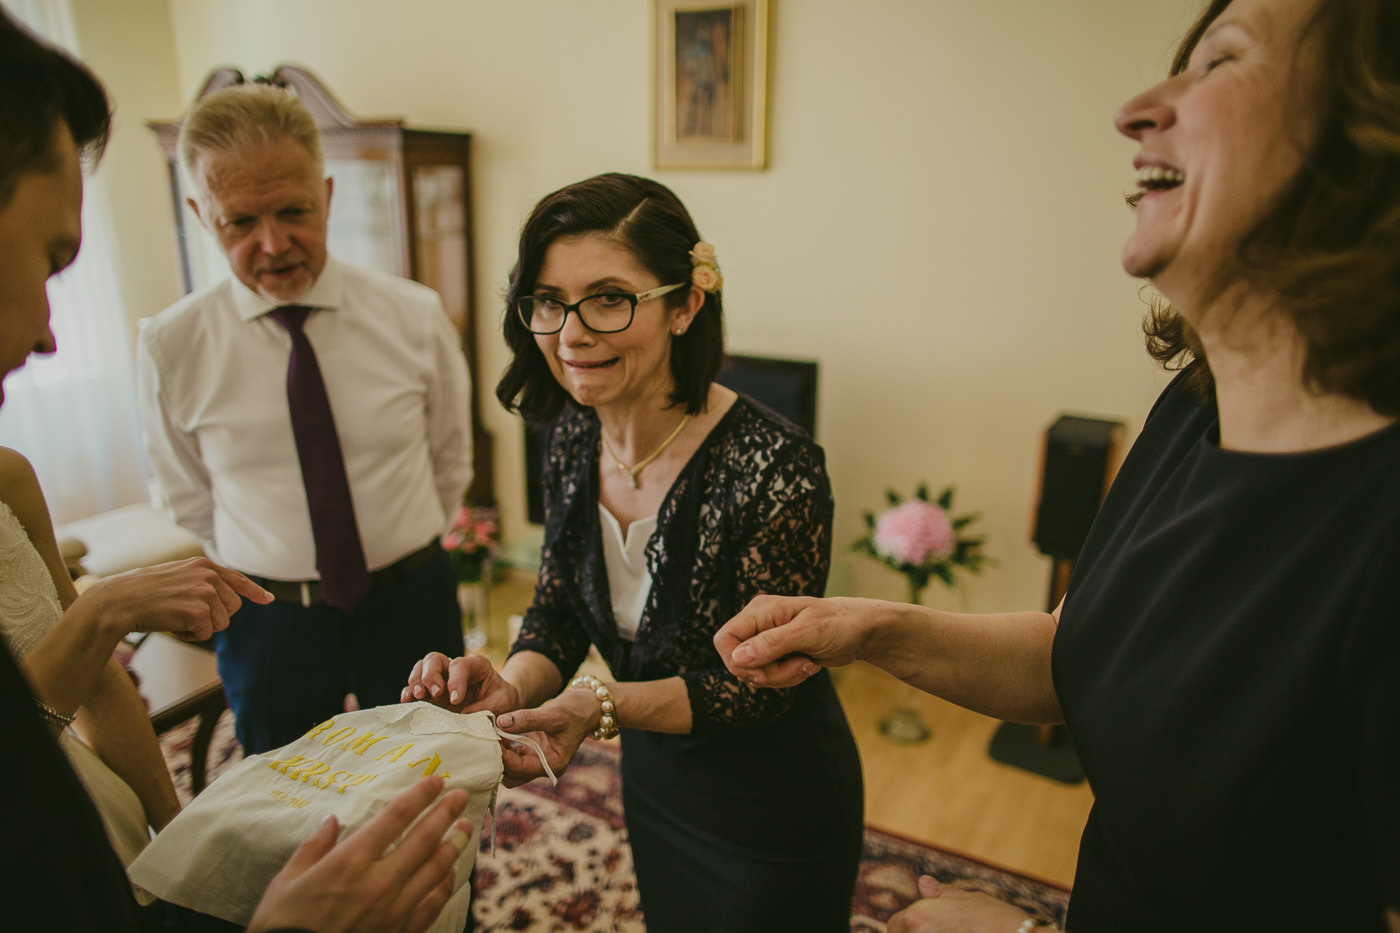 Svadba Bratislava wedding photography 00065